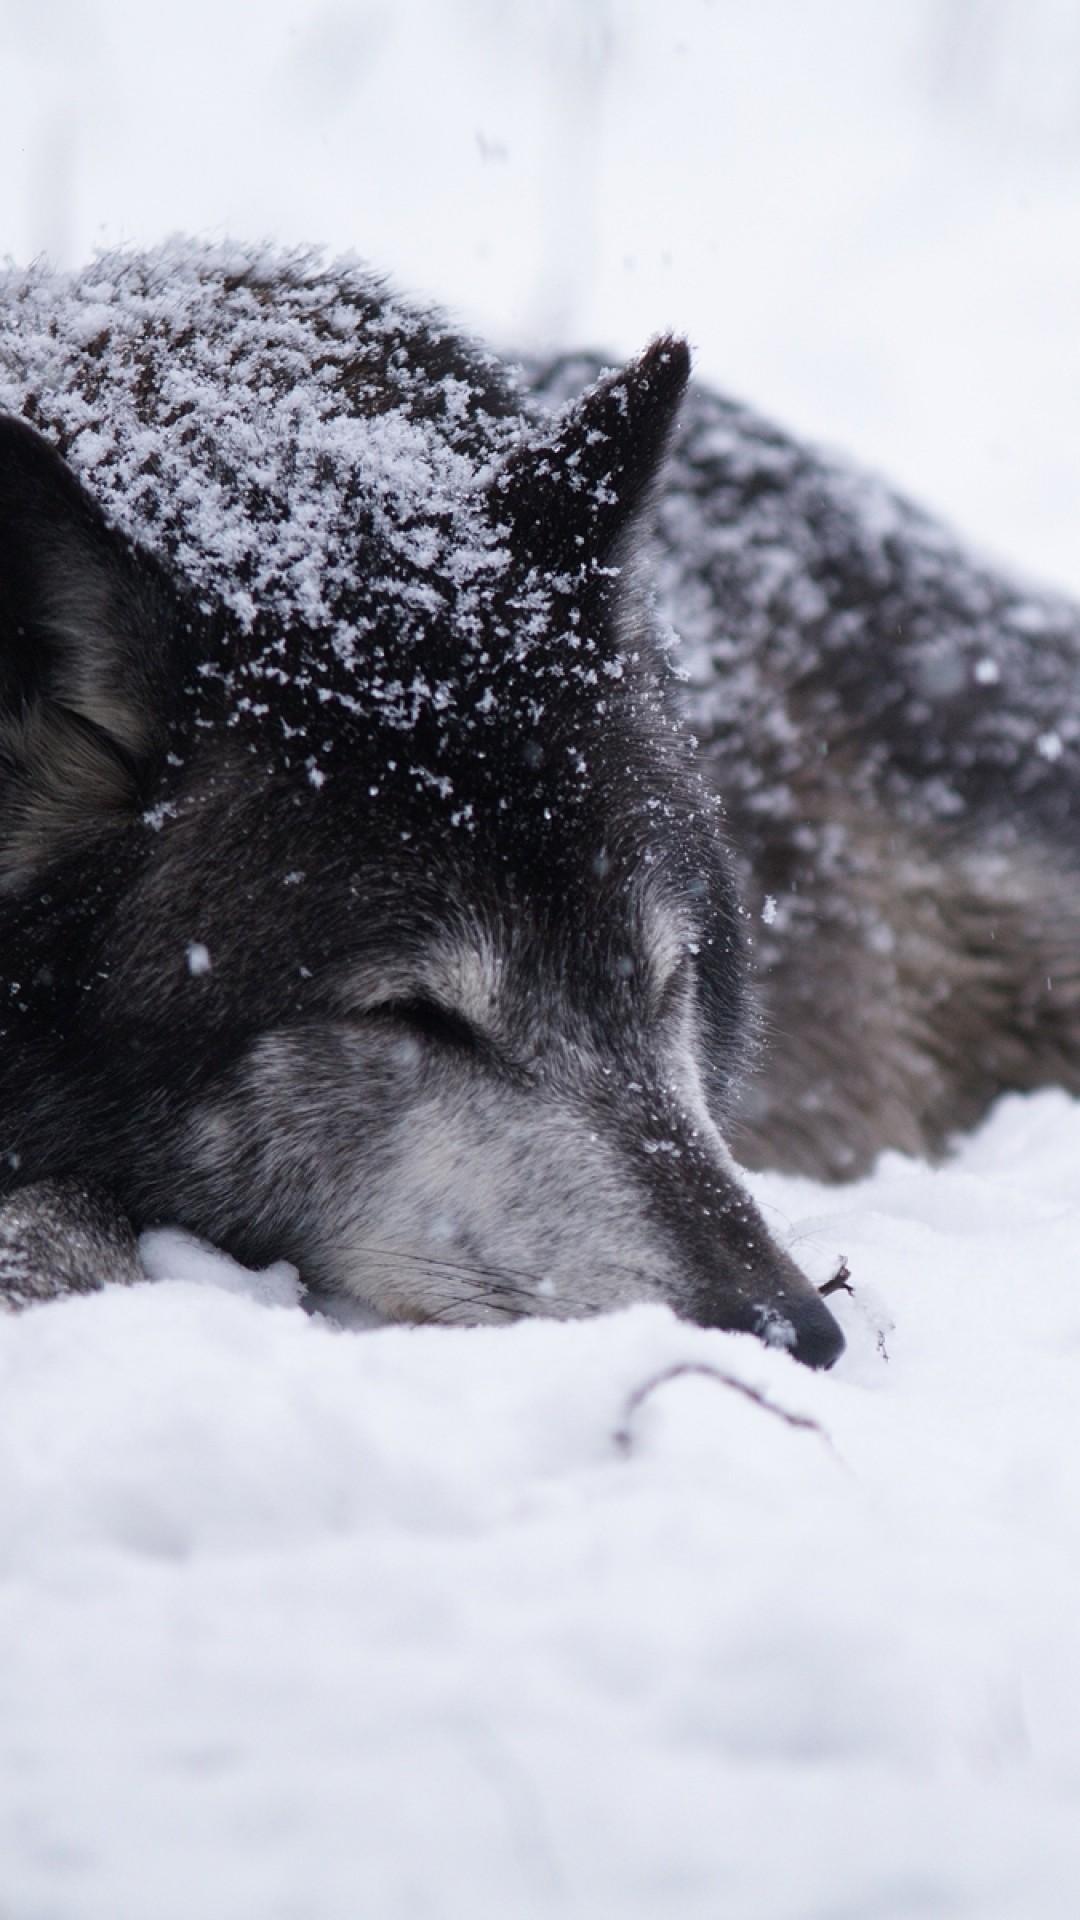 Preview wallpaper wolf, snow, blizzard, cold, warm, black white 1080×1920